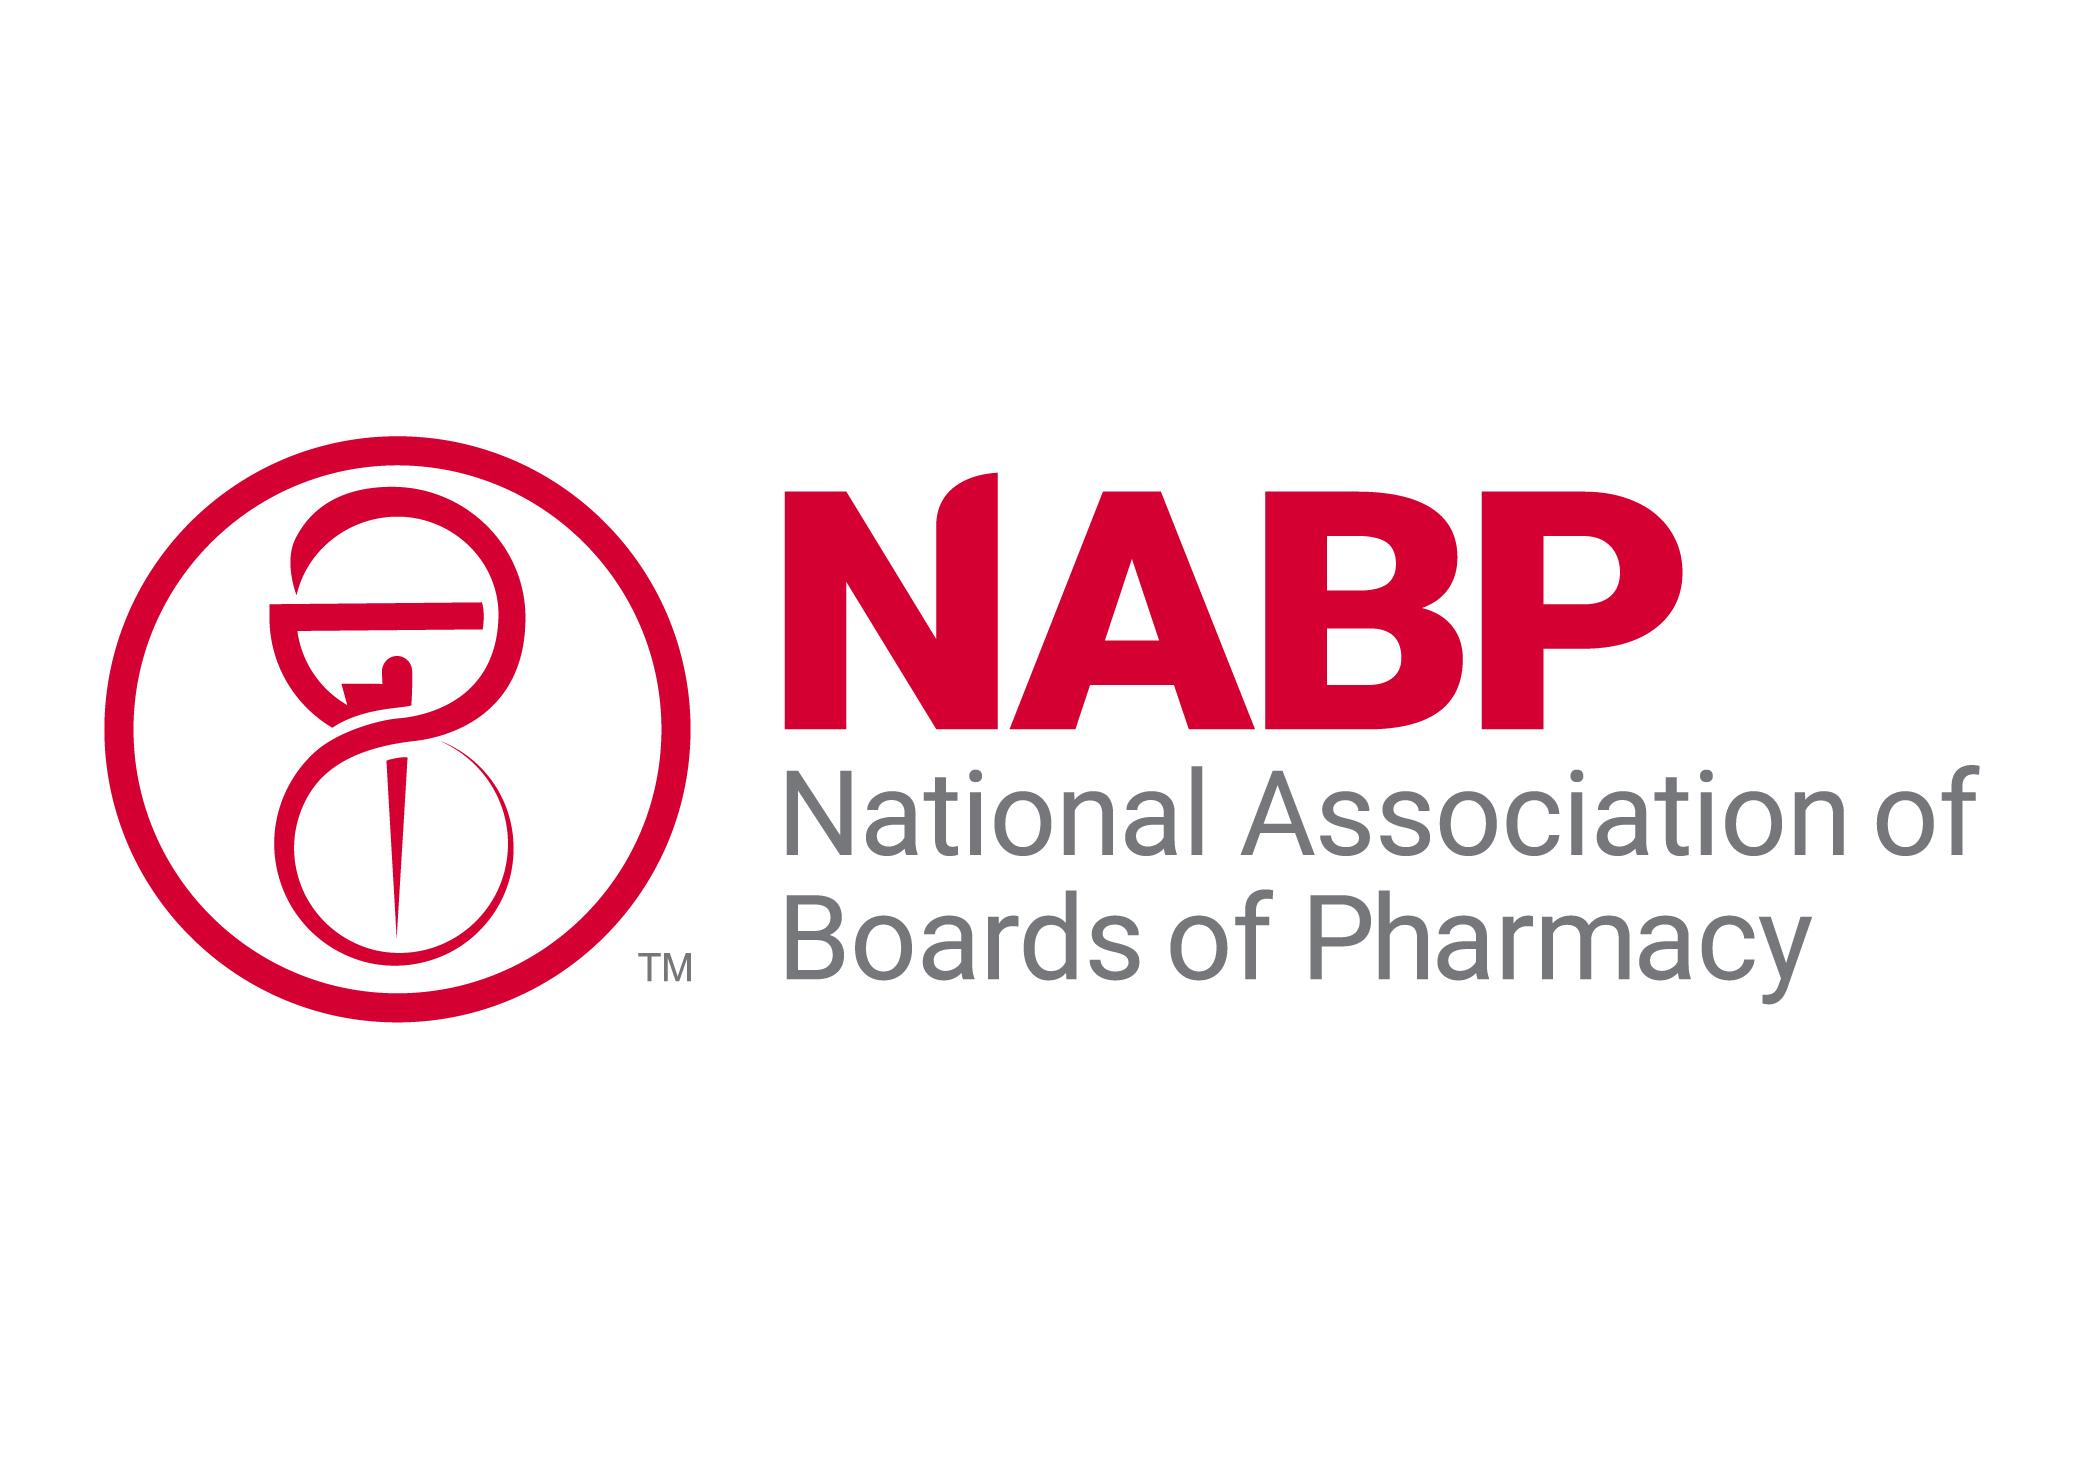 Natl. Assoc. of Boards of Pharmacy